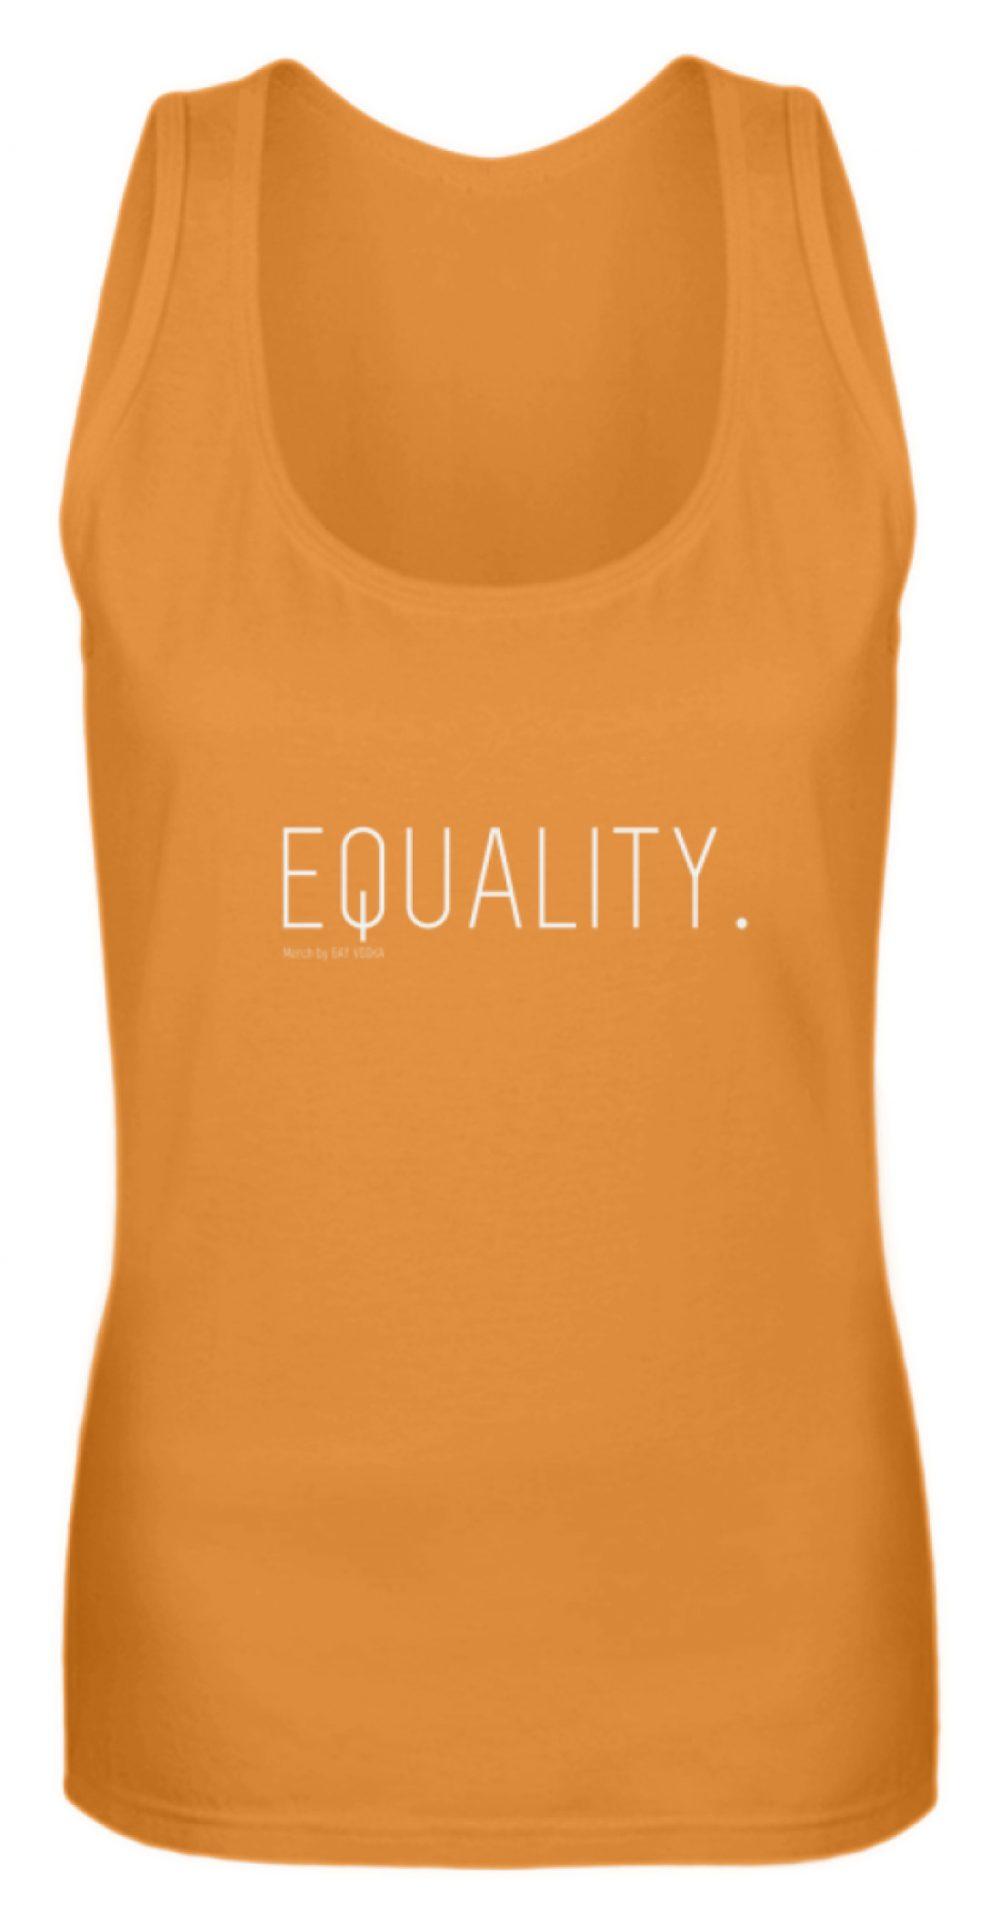 EQUALITY. - Frauen Tanktop-20